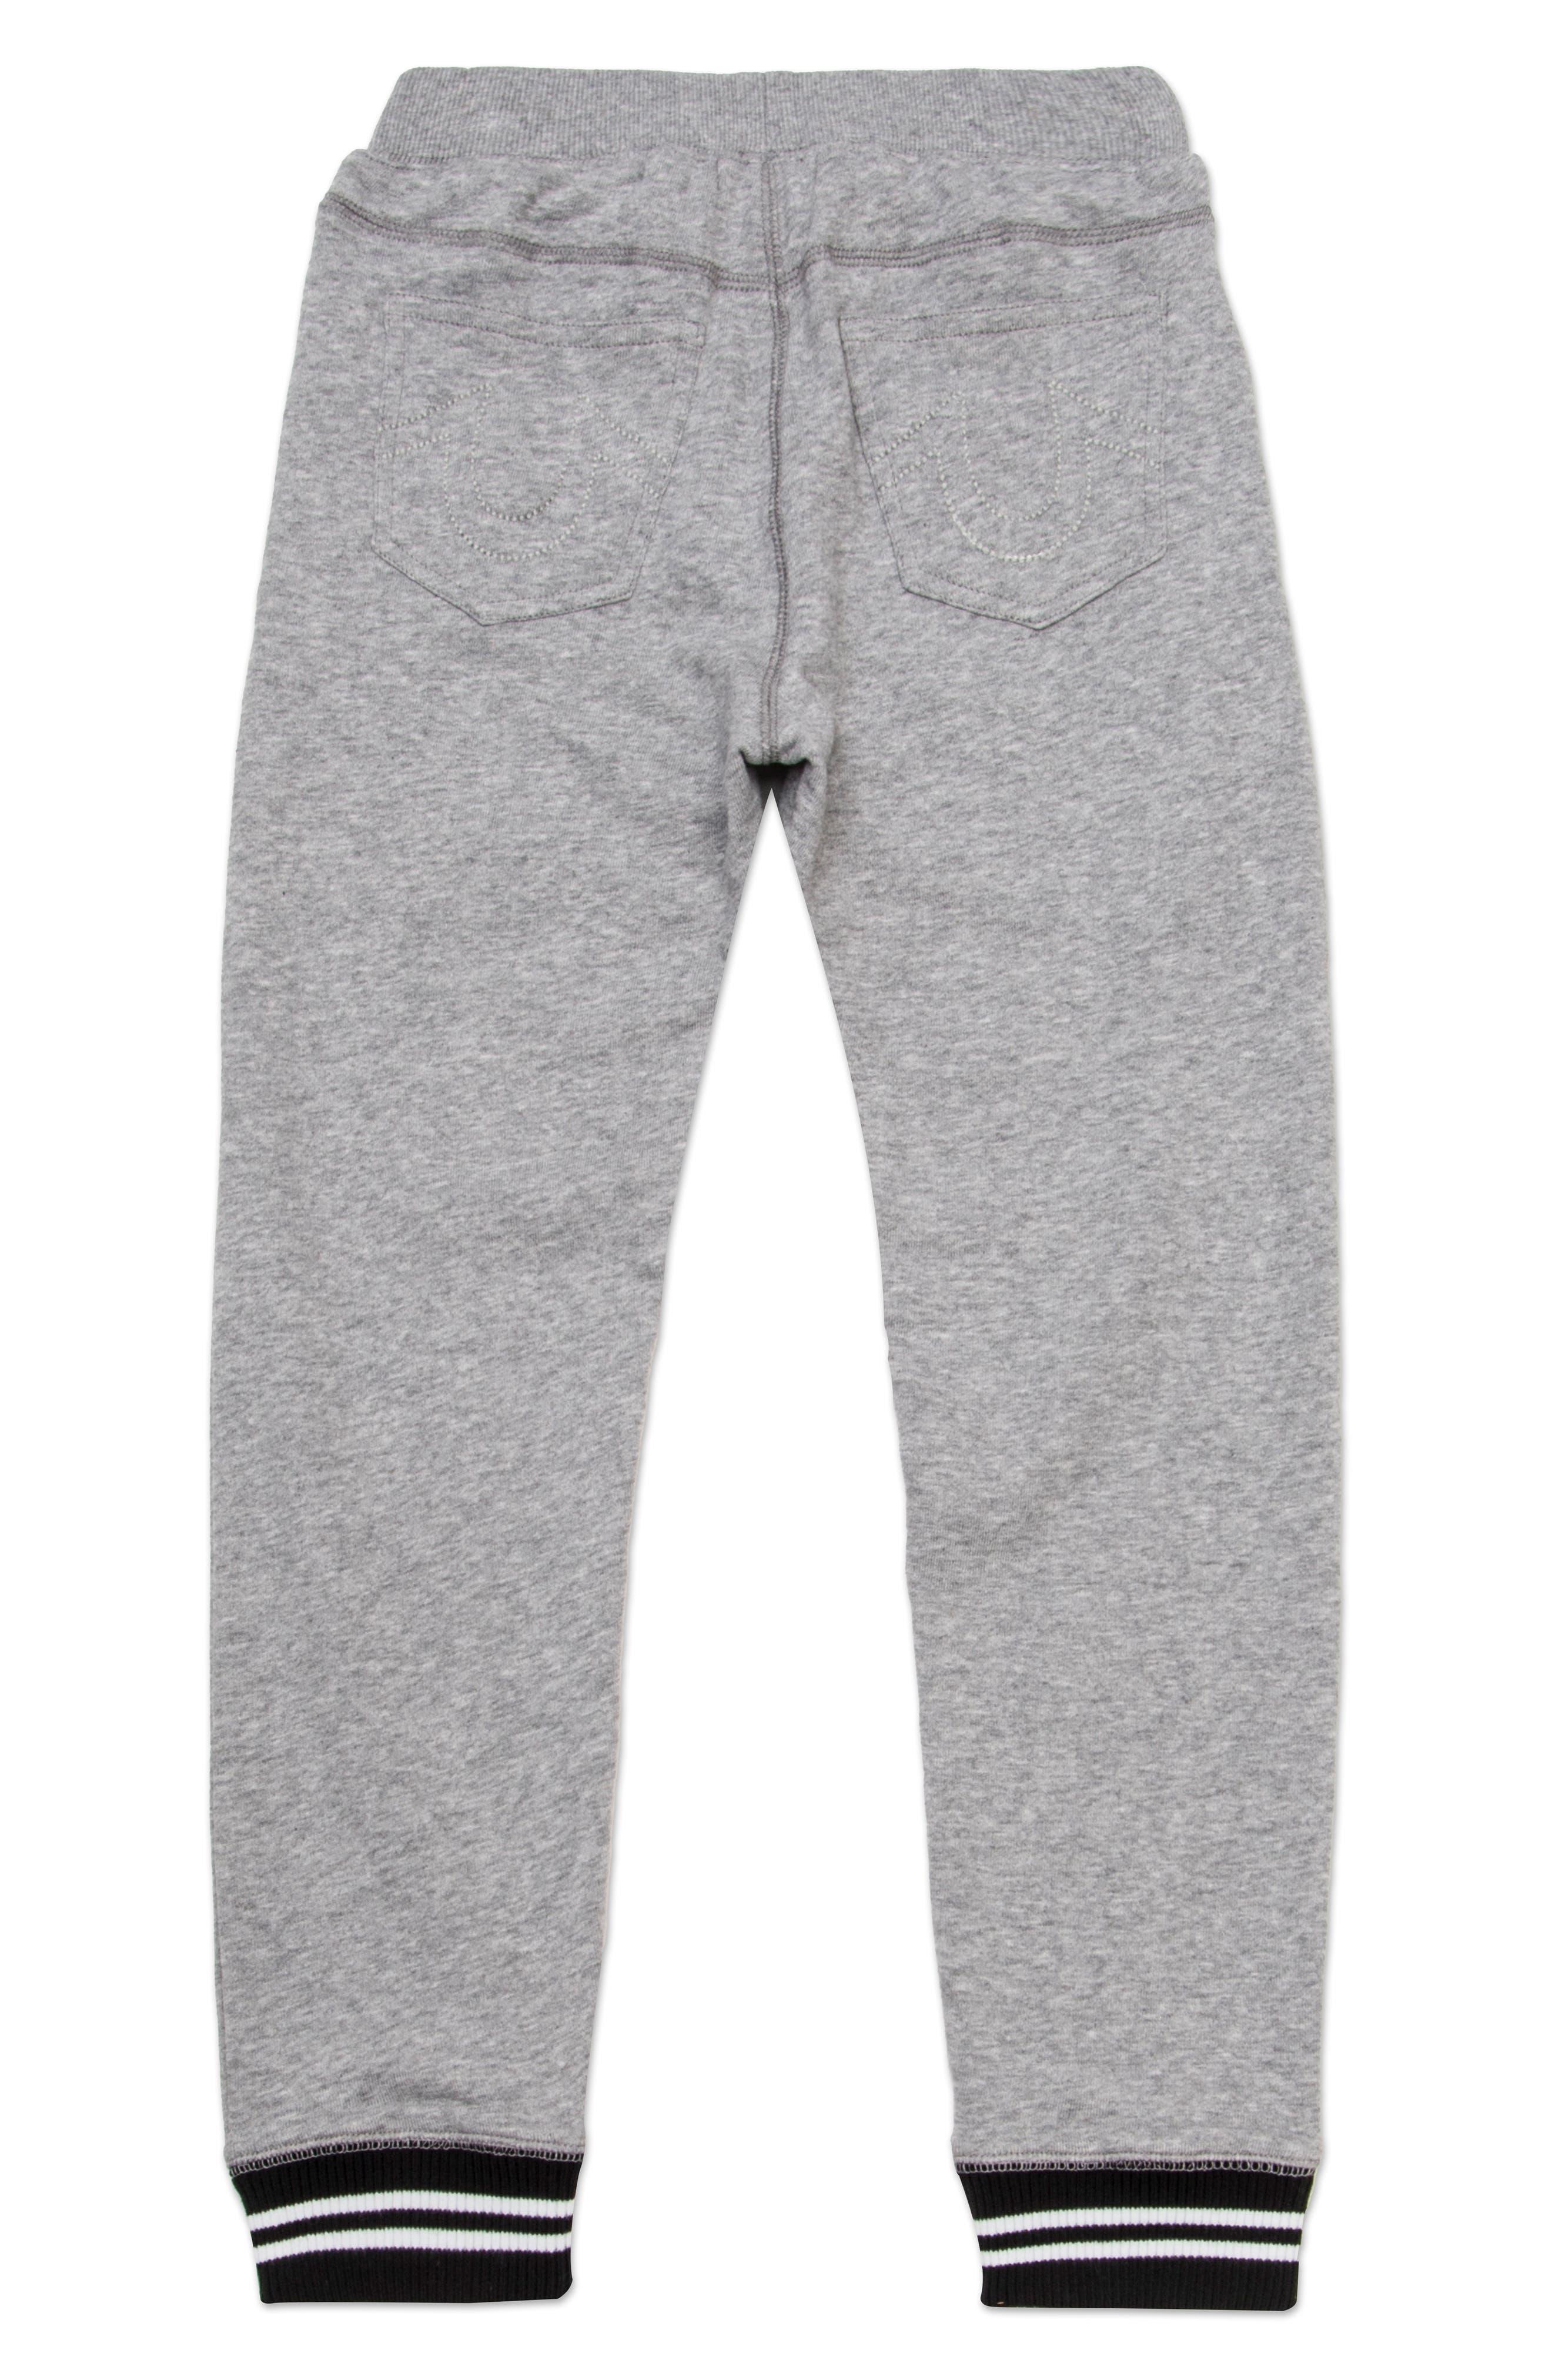 Alternate Image 2  - True Religion Brand Jeans Tipped Sweatpants (Toddler Boys & Little Boys)